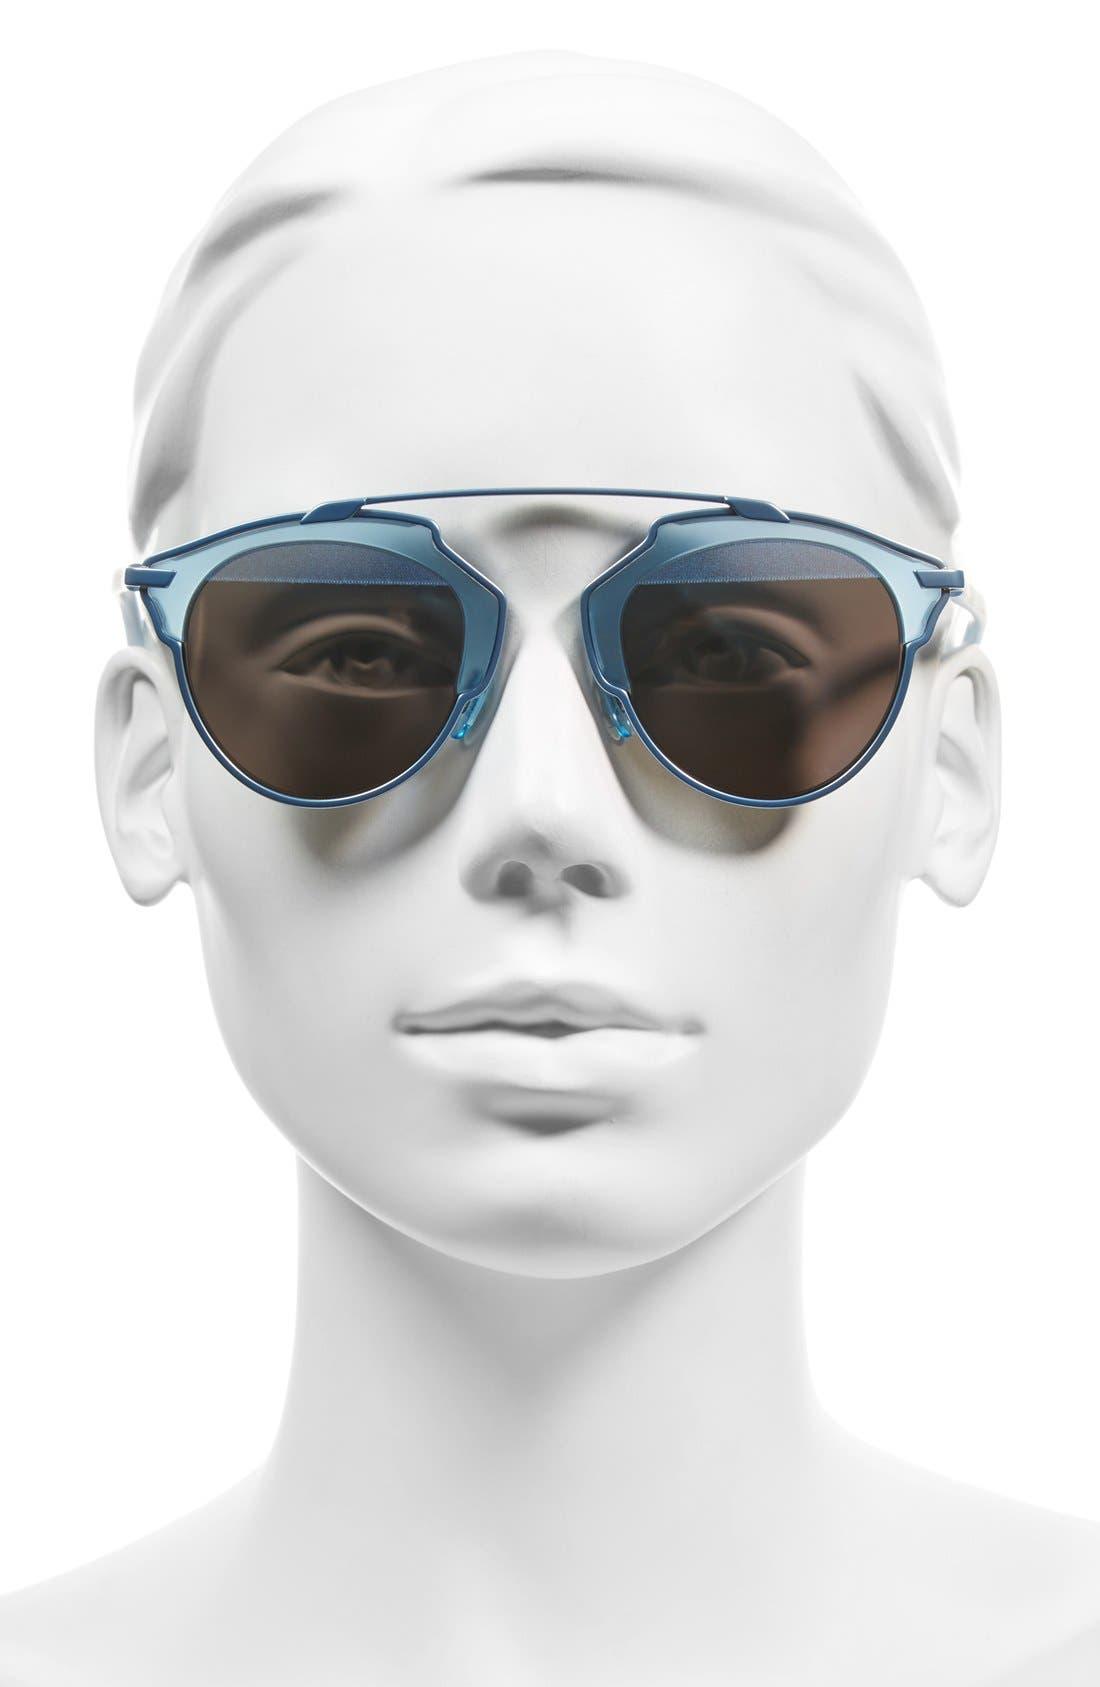 So Real 48mm Brow Bar Sunglasses,                             Alternate thumbnail 43, color,